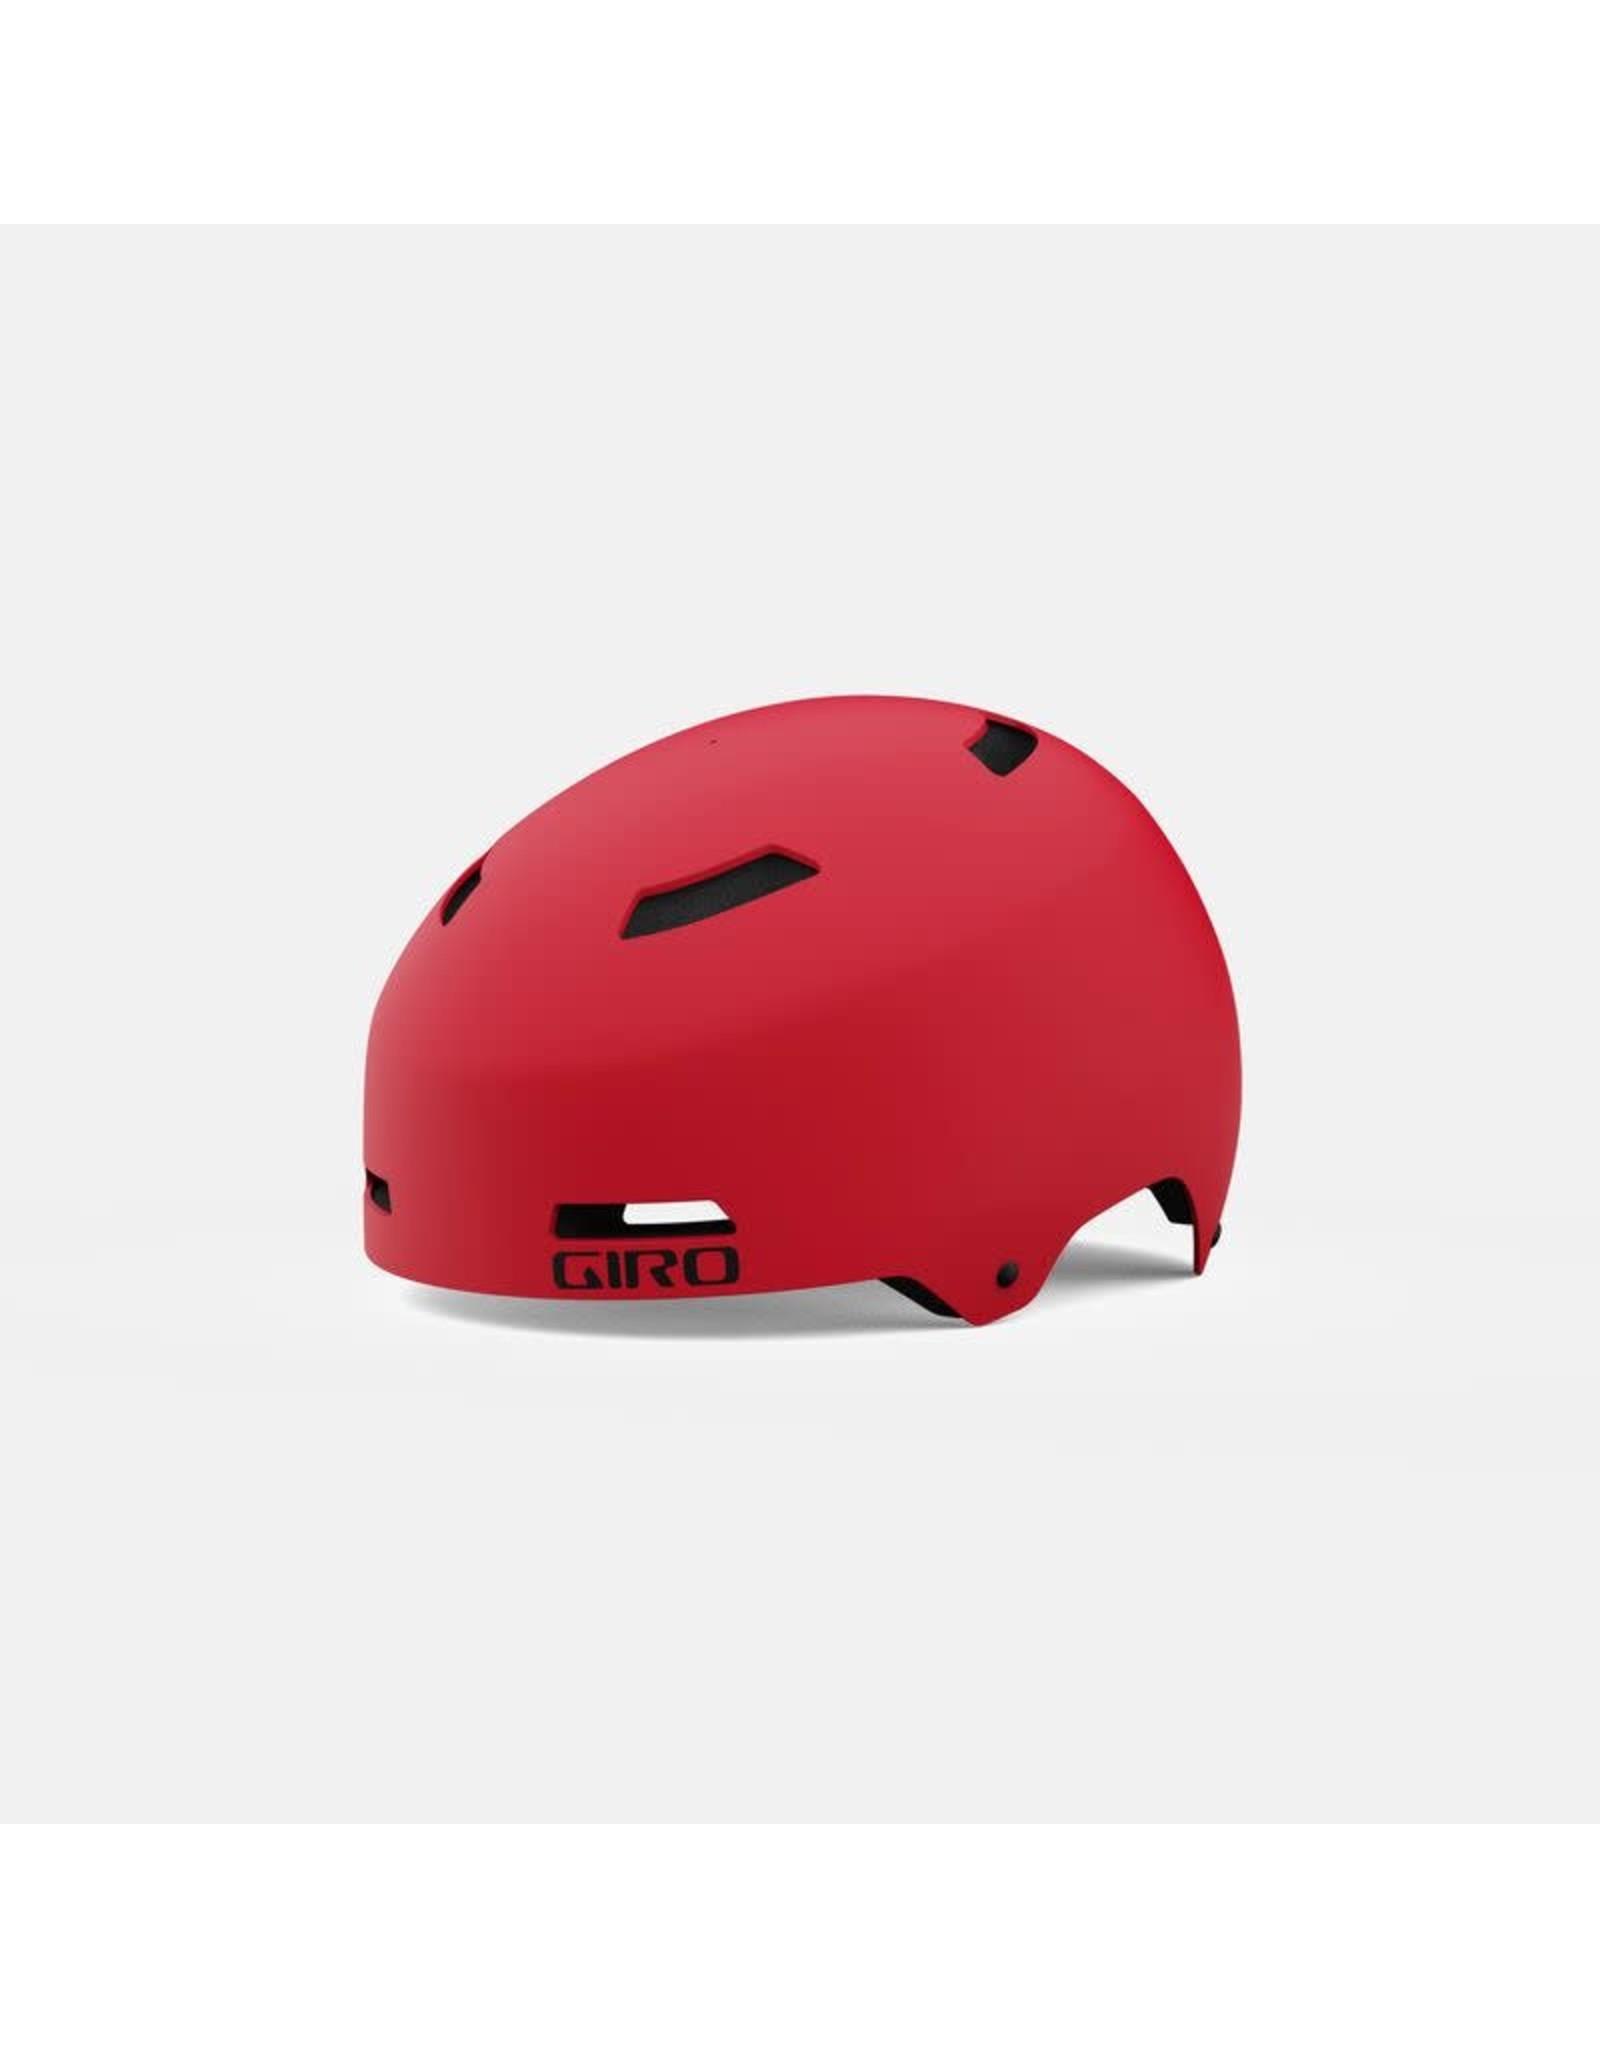 Giro Giro Dime MIPS Helmet - Coral - Small